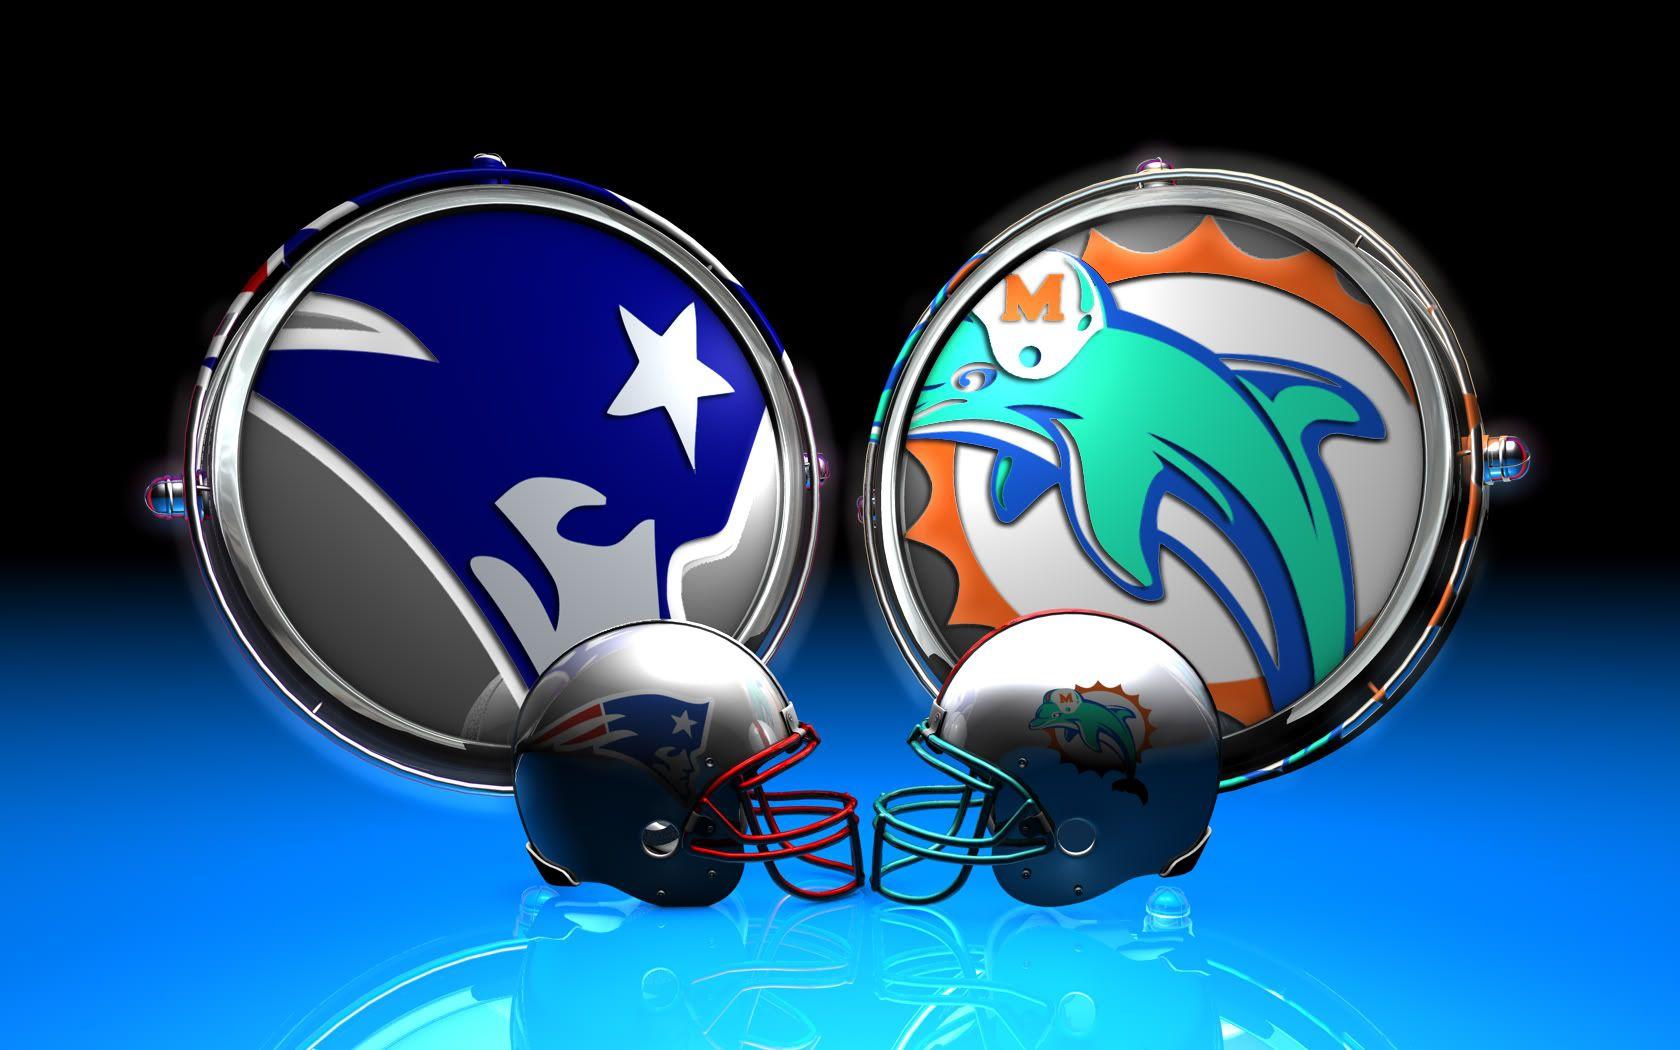 Dolphins Vs Patriots New England Patriots Patriots Dolphins Football